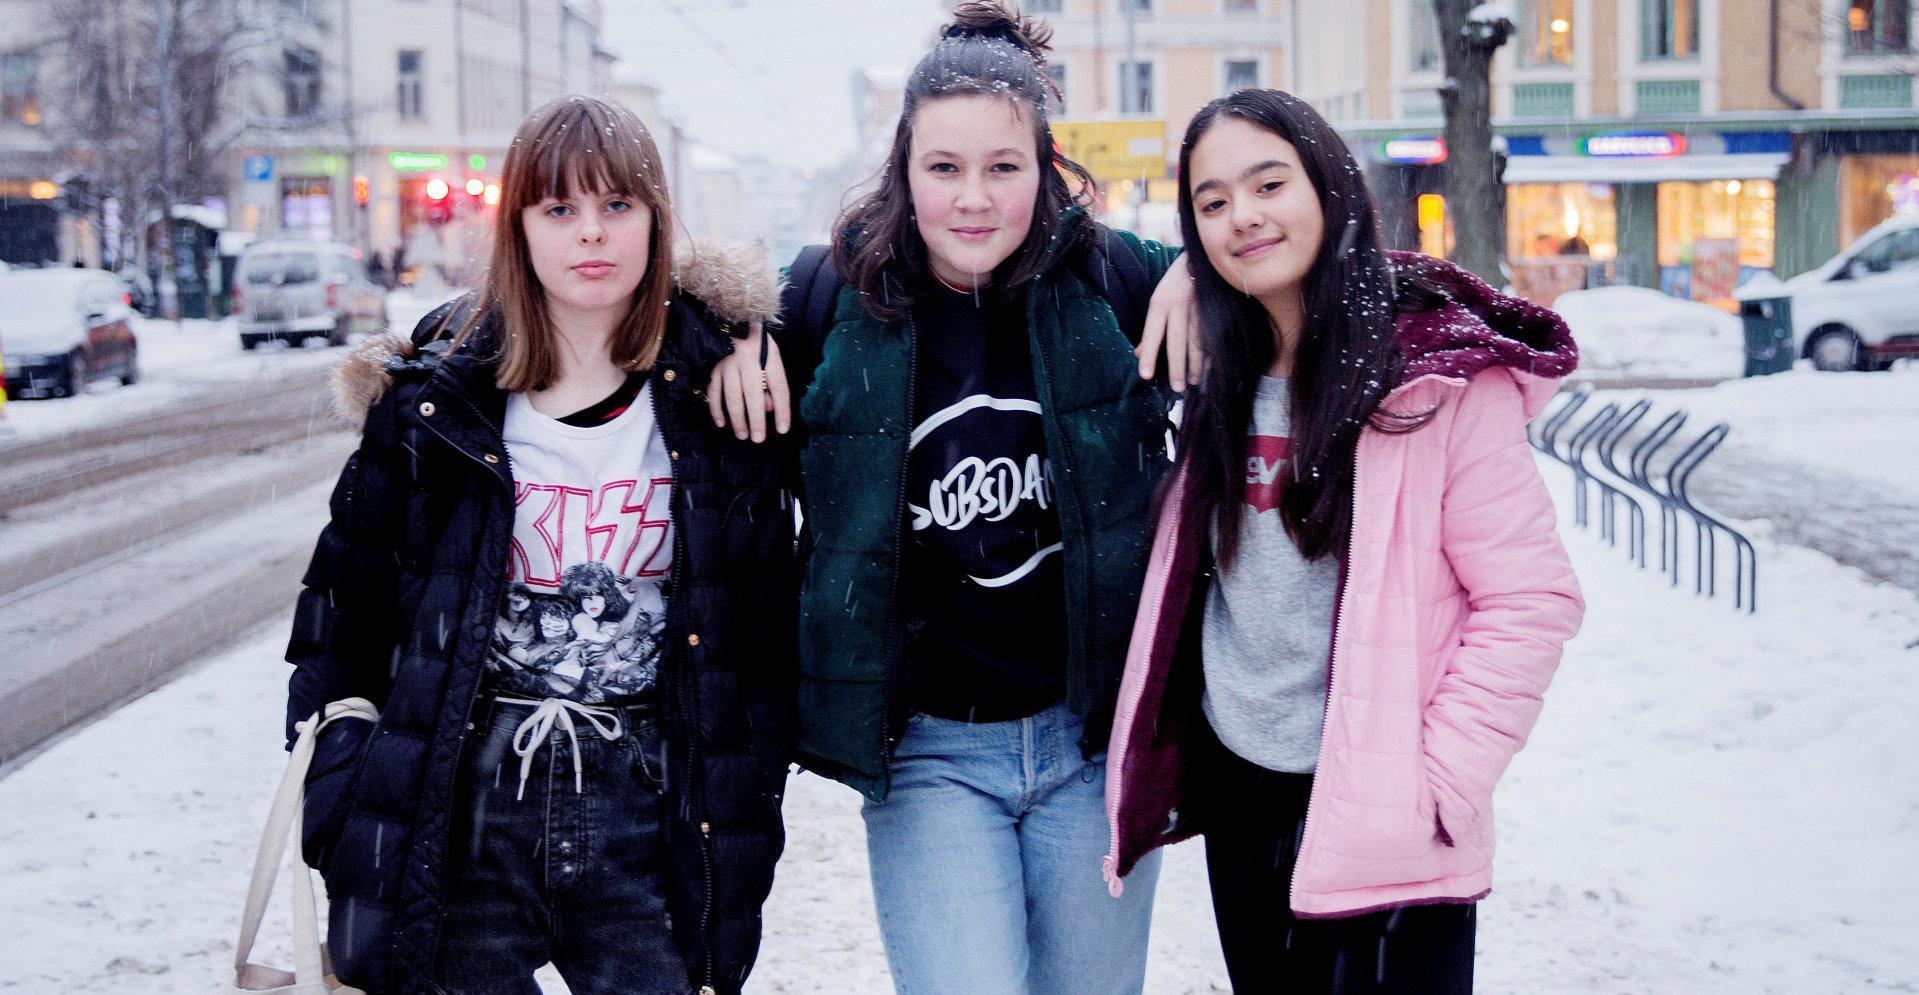 Snapchat norske brukernavn jenter Live Sex